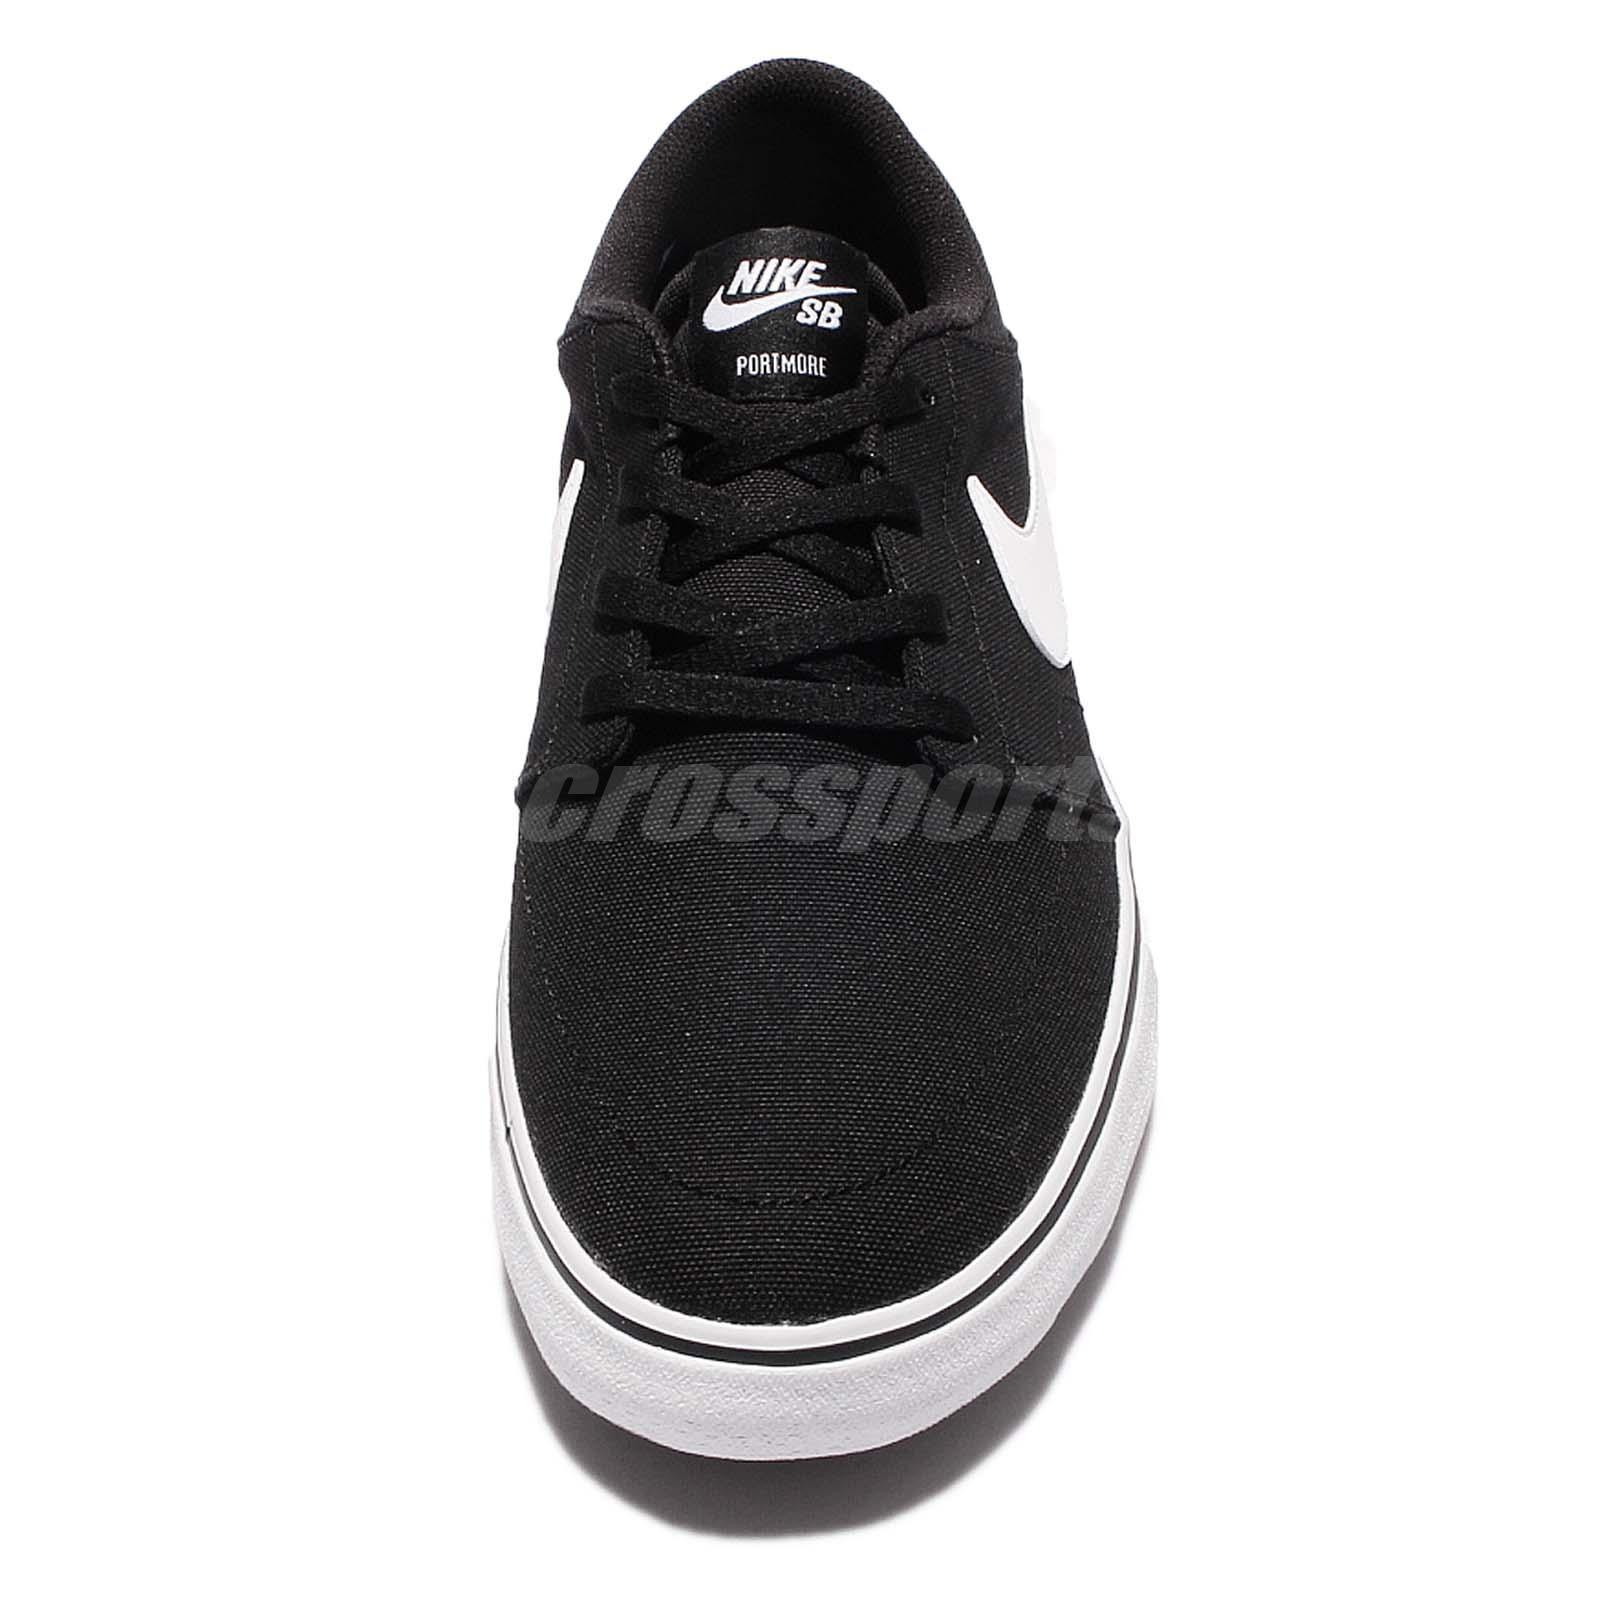 Nike Sb Portmore Ii 2 Solar Cnvs Canvs Men Black Shoes